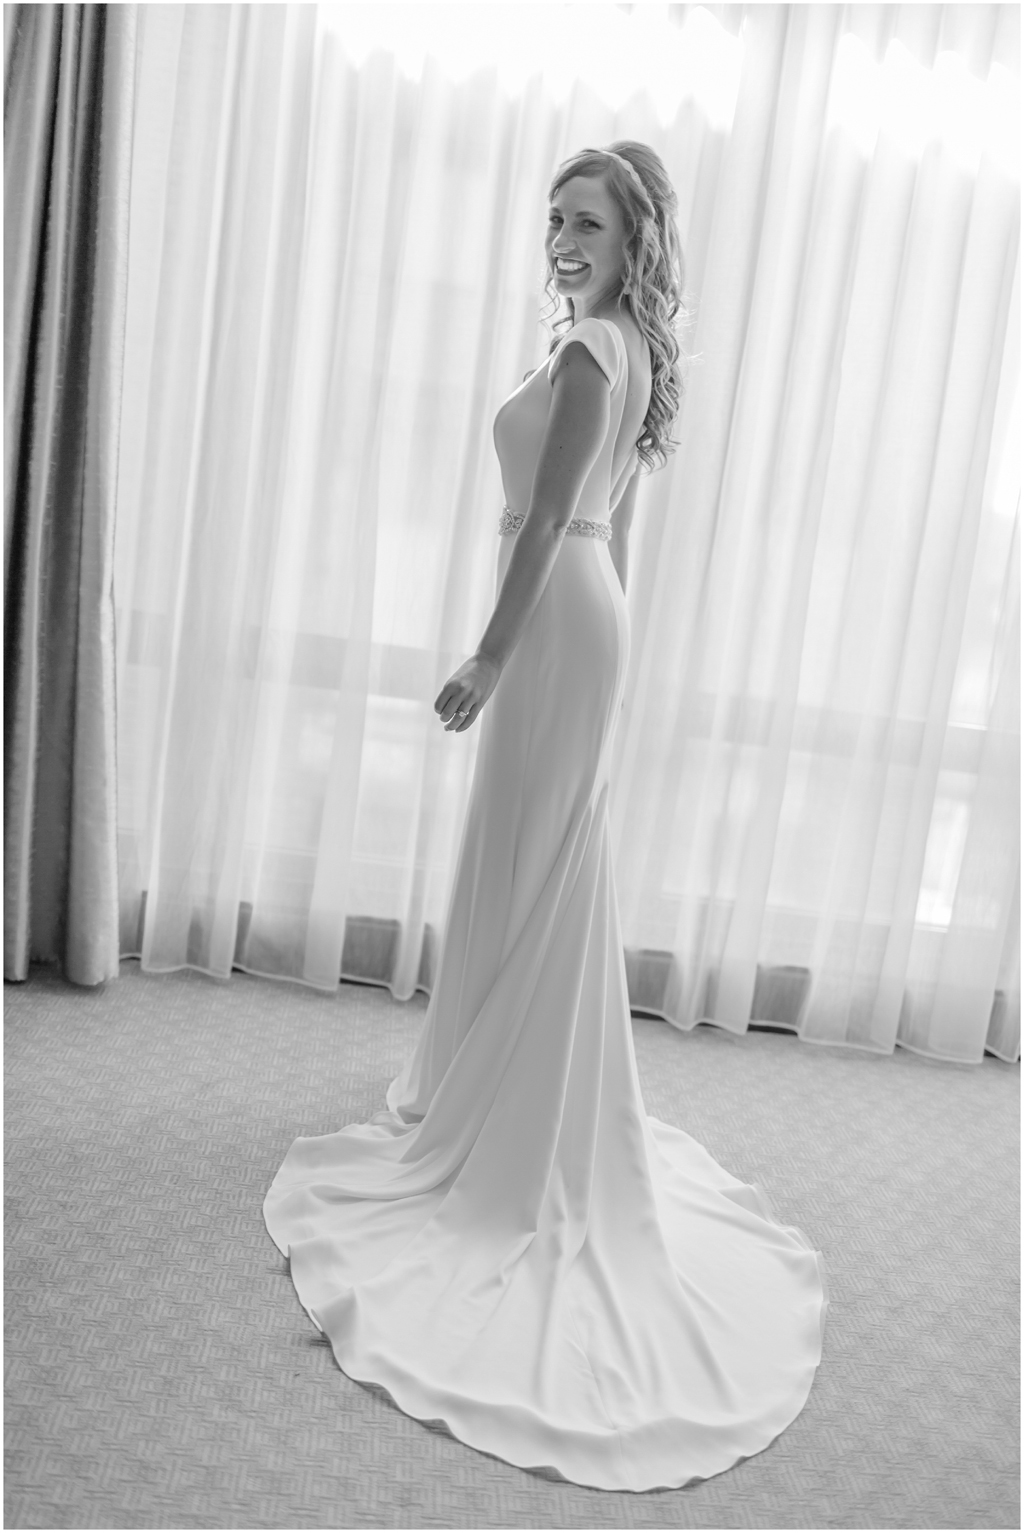 ritz-carlton-georgetown-wedding-washington-dc-photography-liz-stewart-photo-00009